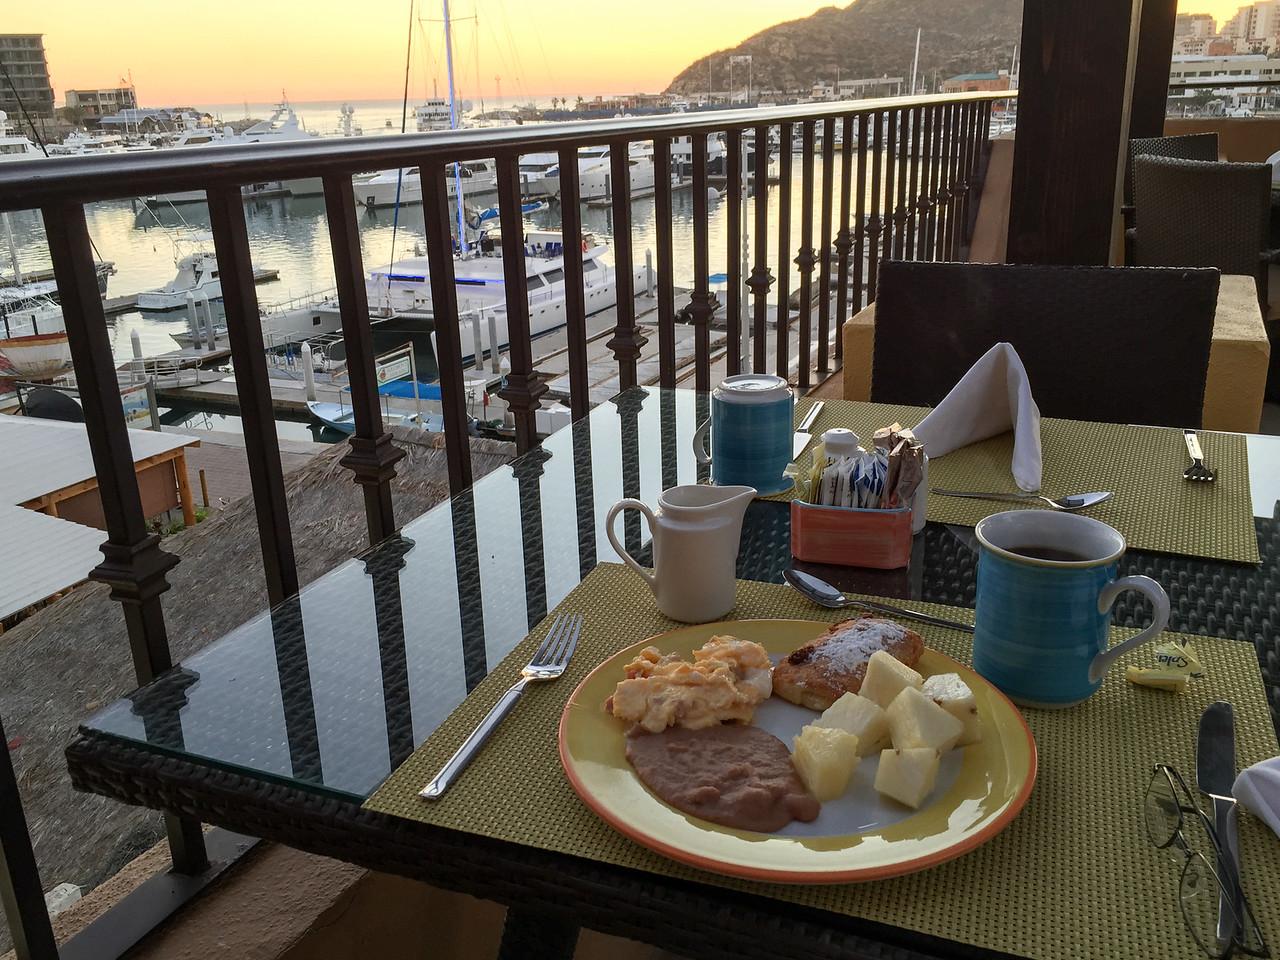 Breakfast at Wyndham Cabo San Lucas Resort - January 2015 (iPhone image)